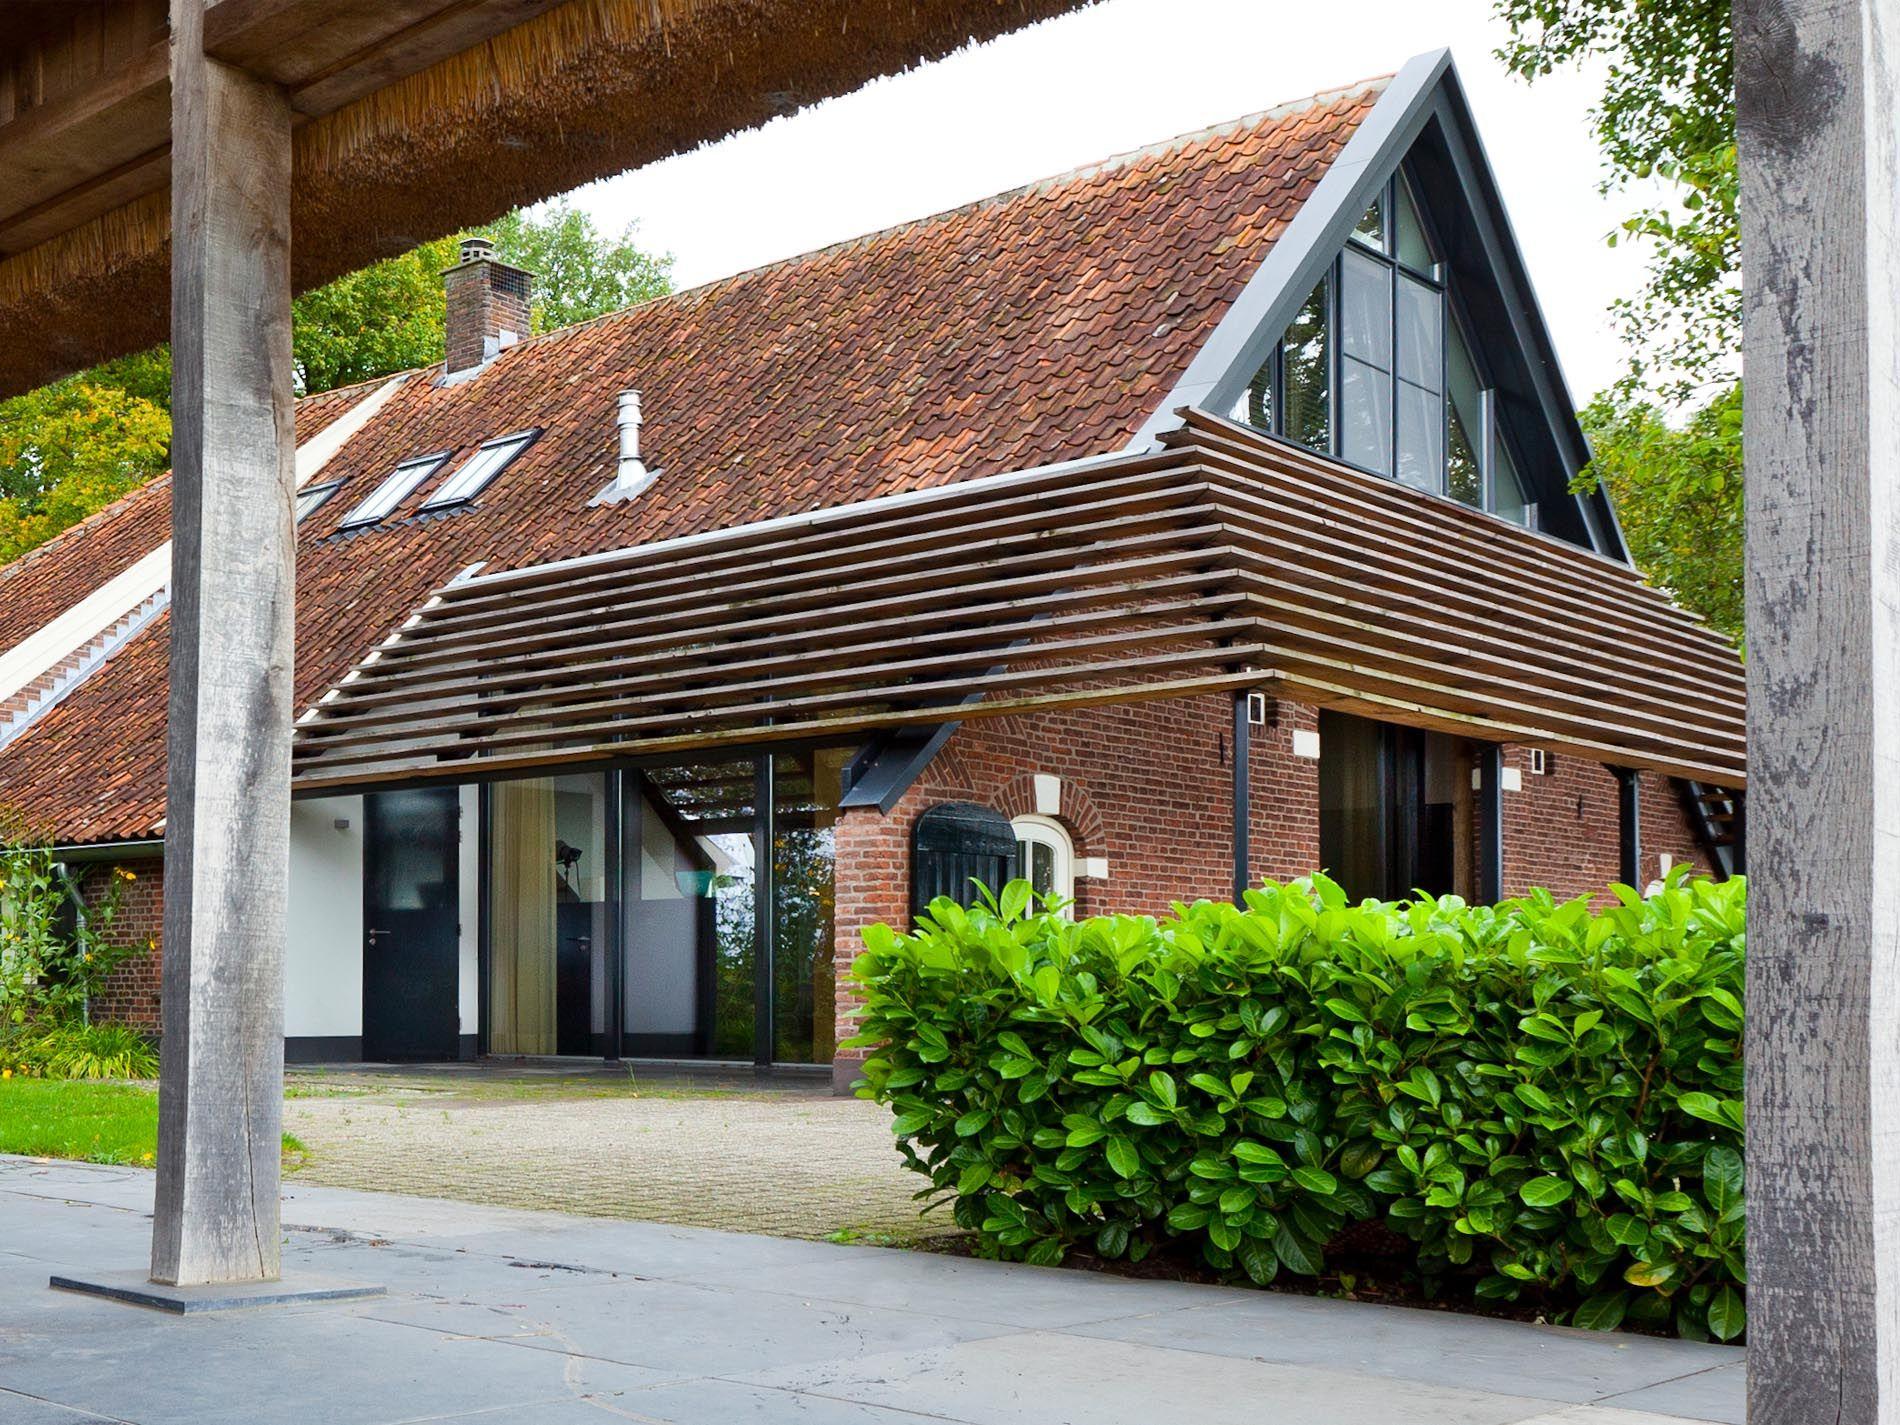 Maas architecten verbouwing boerderij tot woonhuis for Boerderij interieur